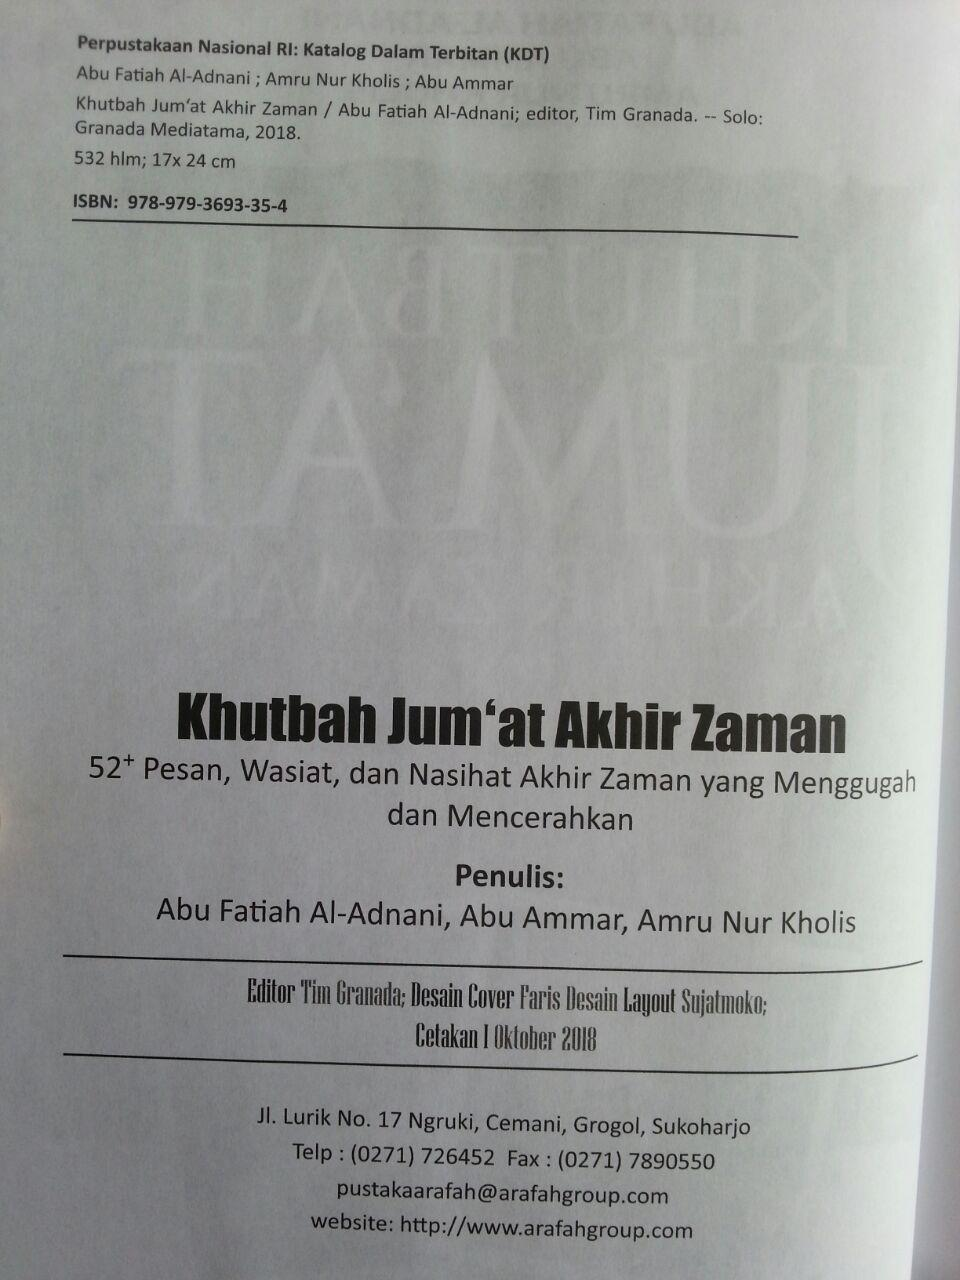 Buku Khutbah Jum'at Akhir Zaman 52 Pesan Wasiat Nasihat Menggugah isi 2